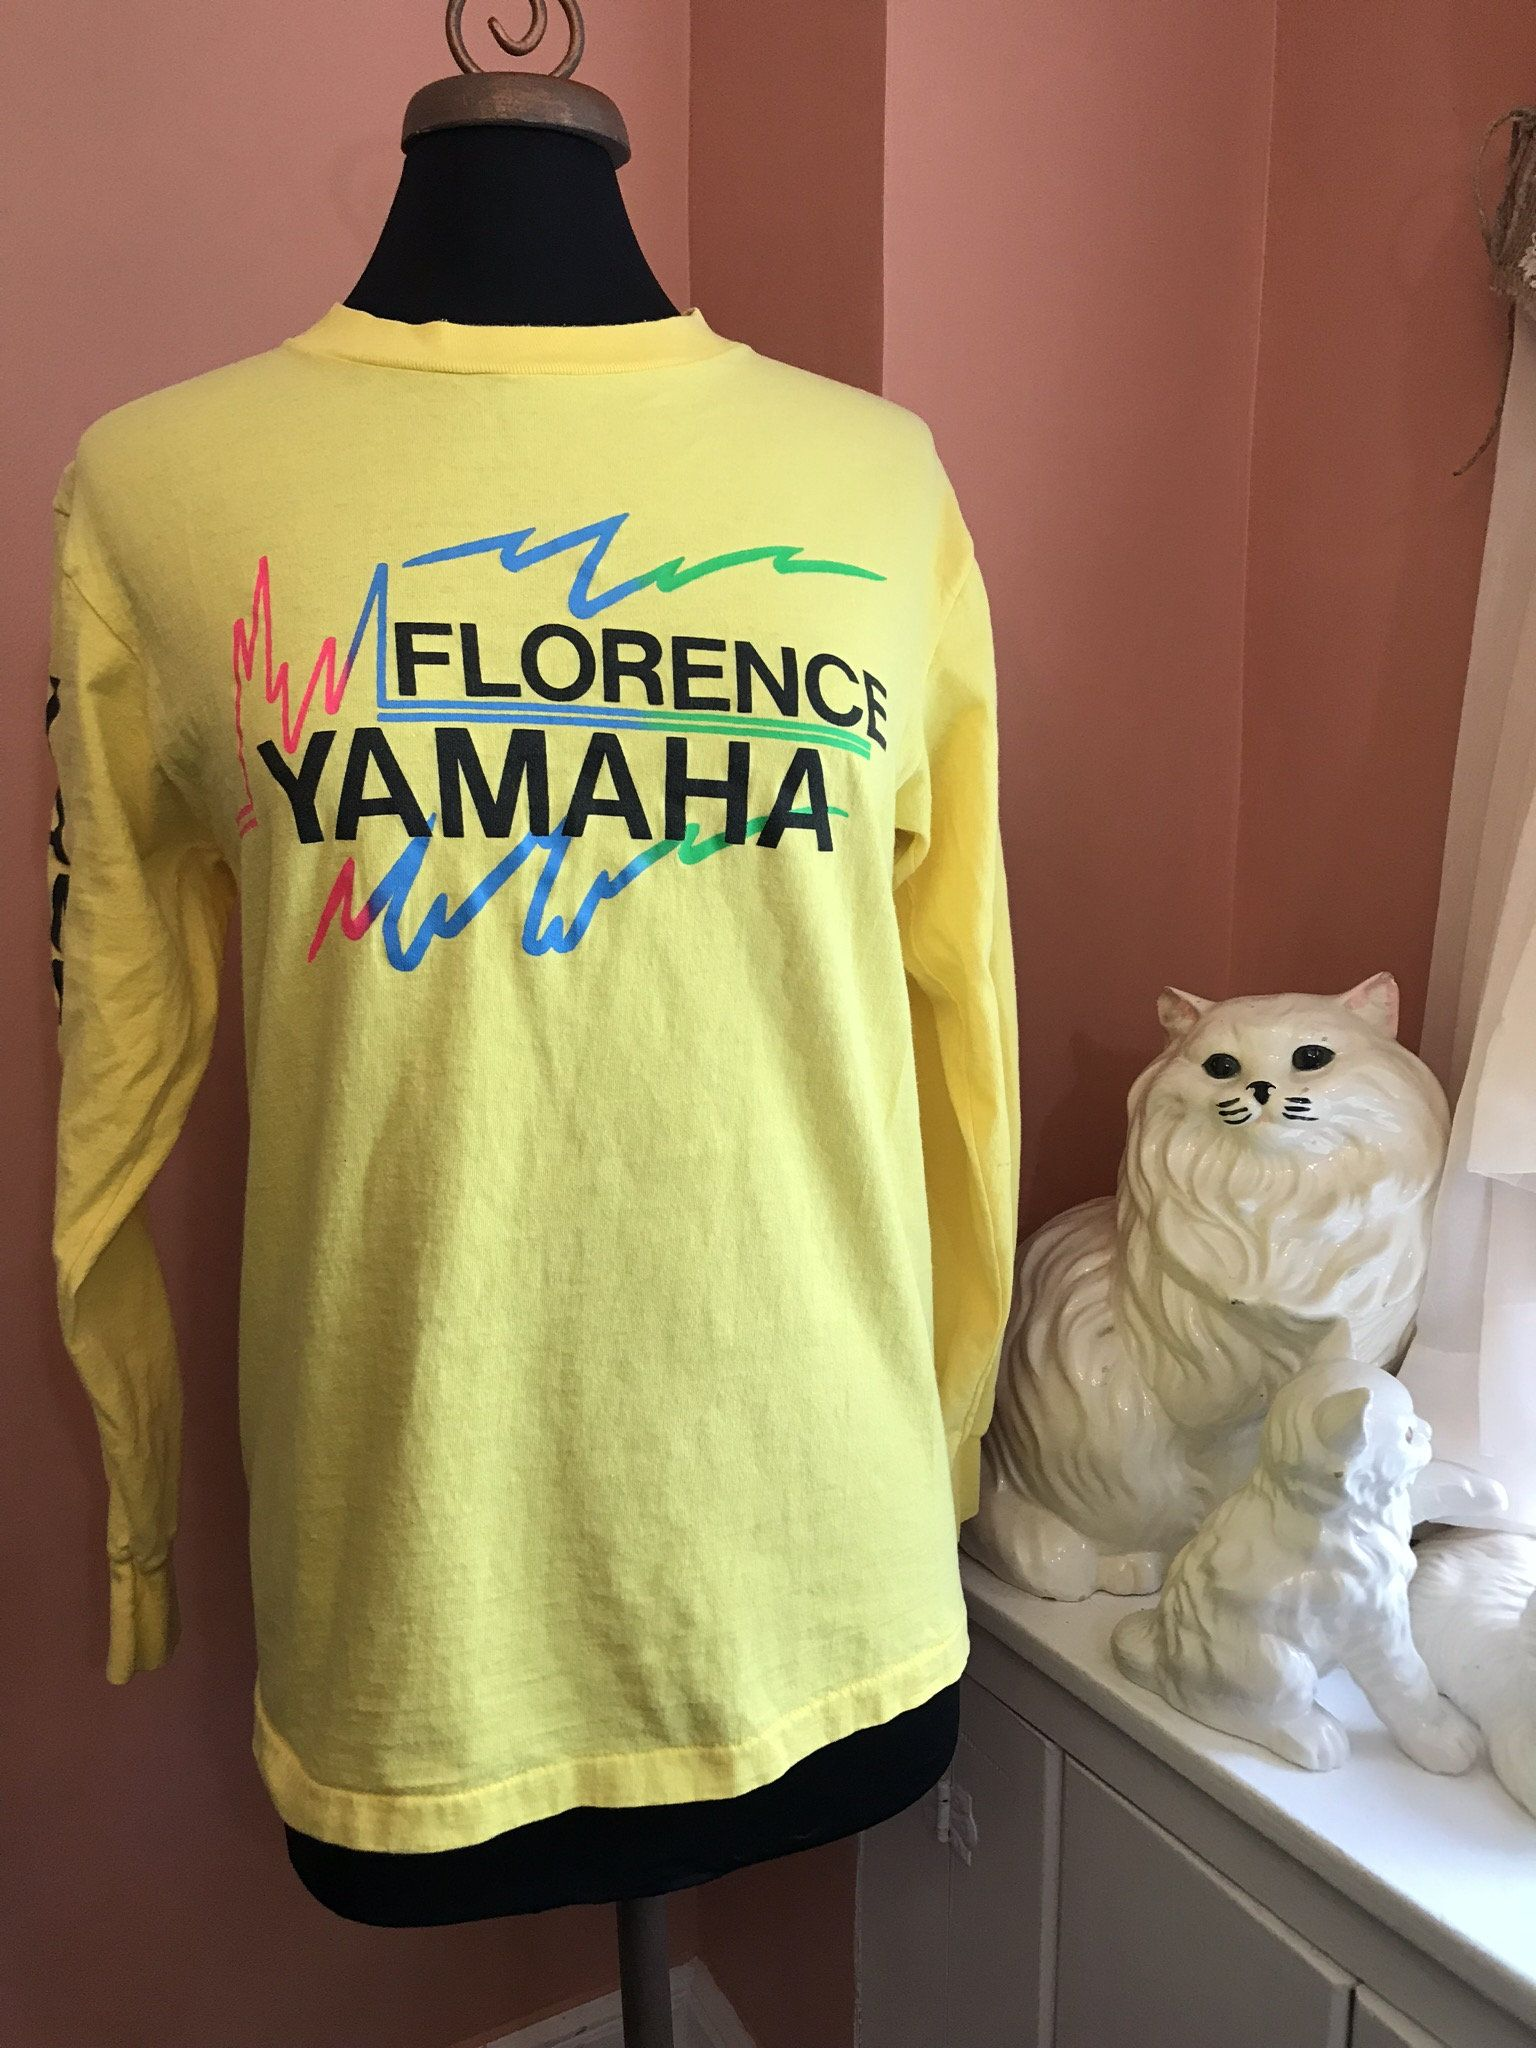 80s T Shirt Vintage Yamaha Racing Vintage 80s Jersey Florence Yamaha Suzuki Dirt Bike Motorcycle Trucks Off Yamaha Classic Cars Vintage Yamaha Racing